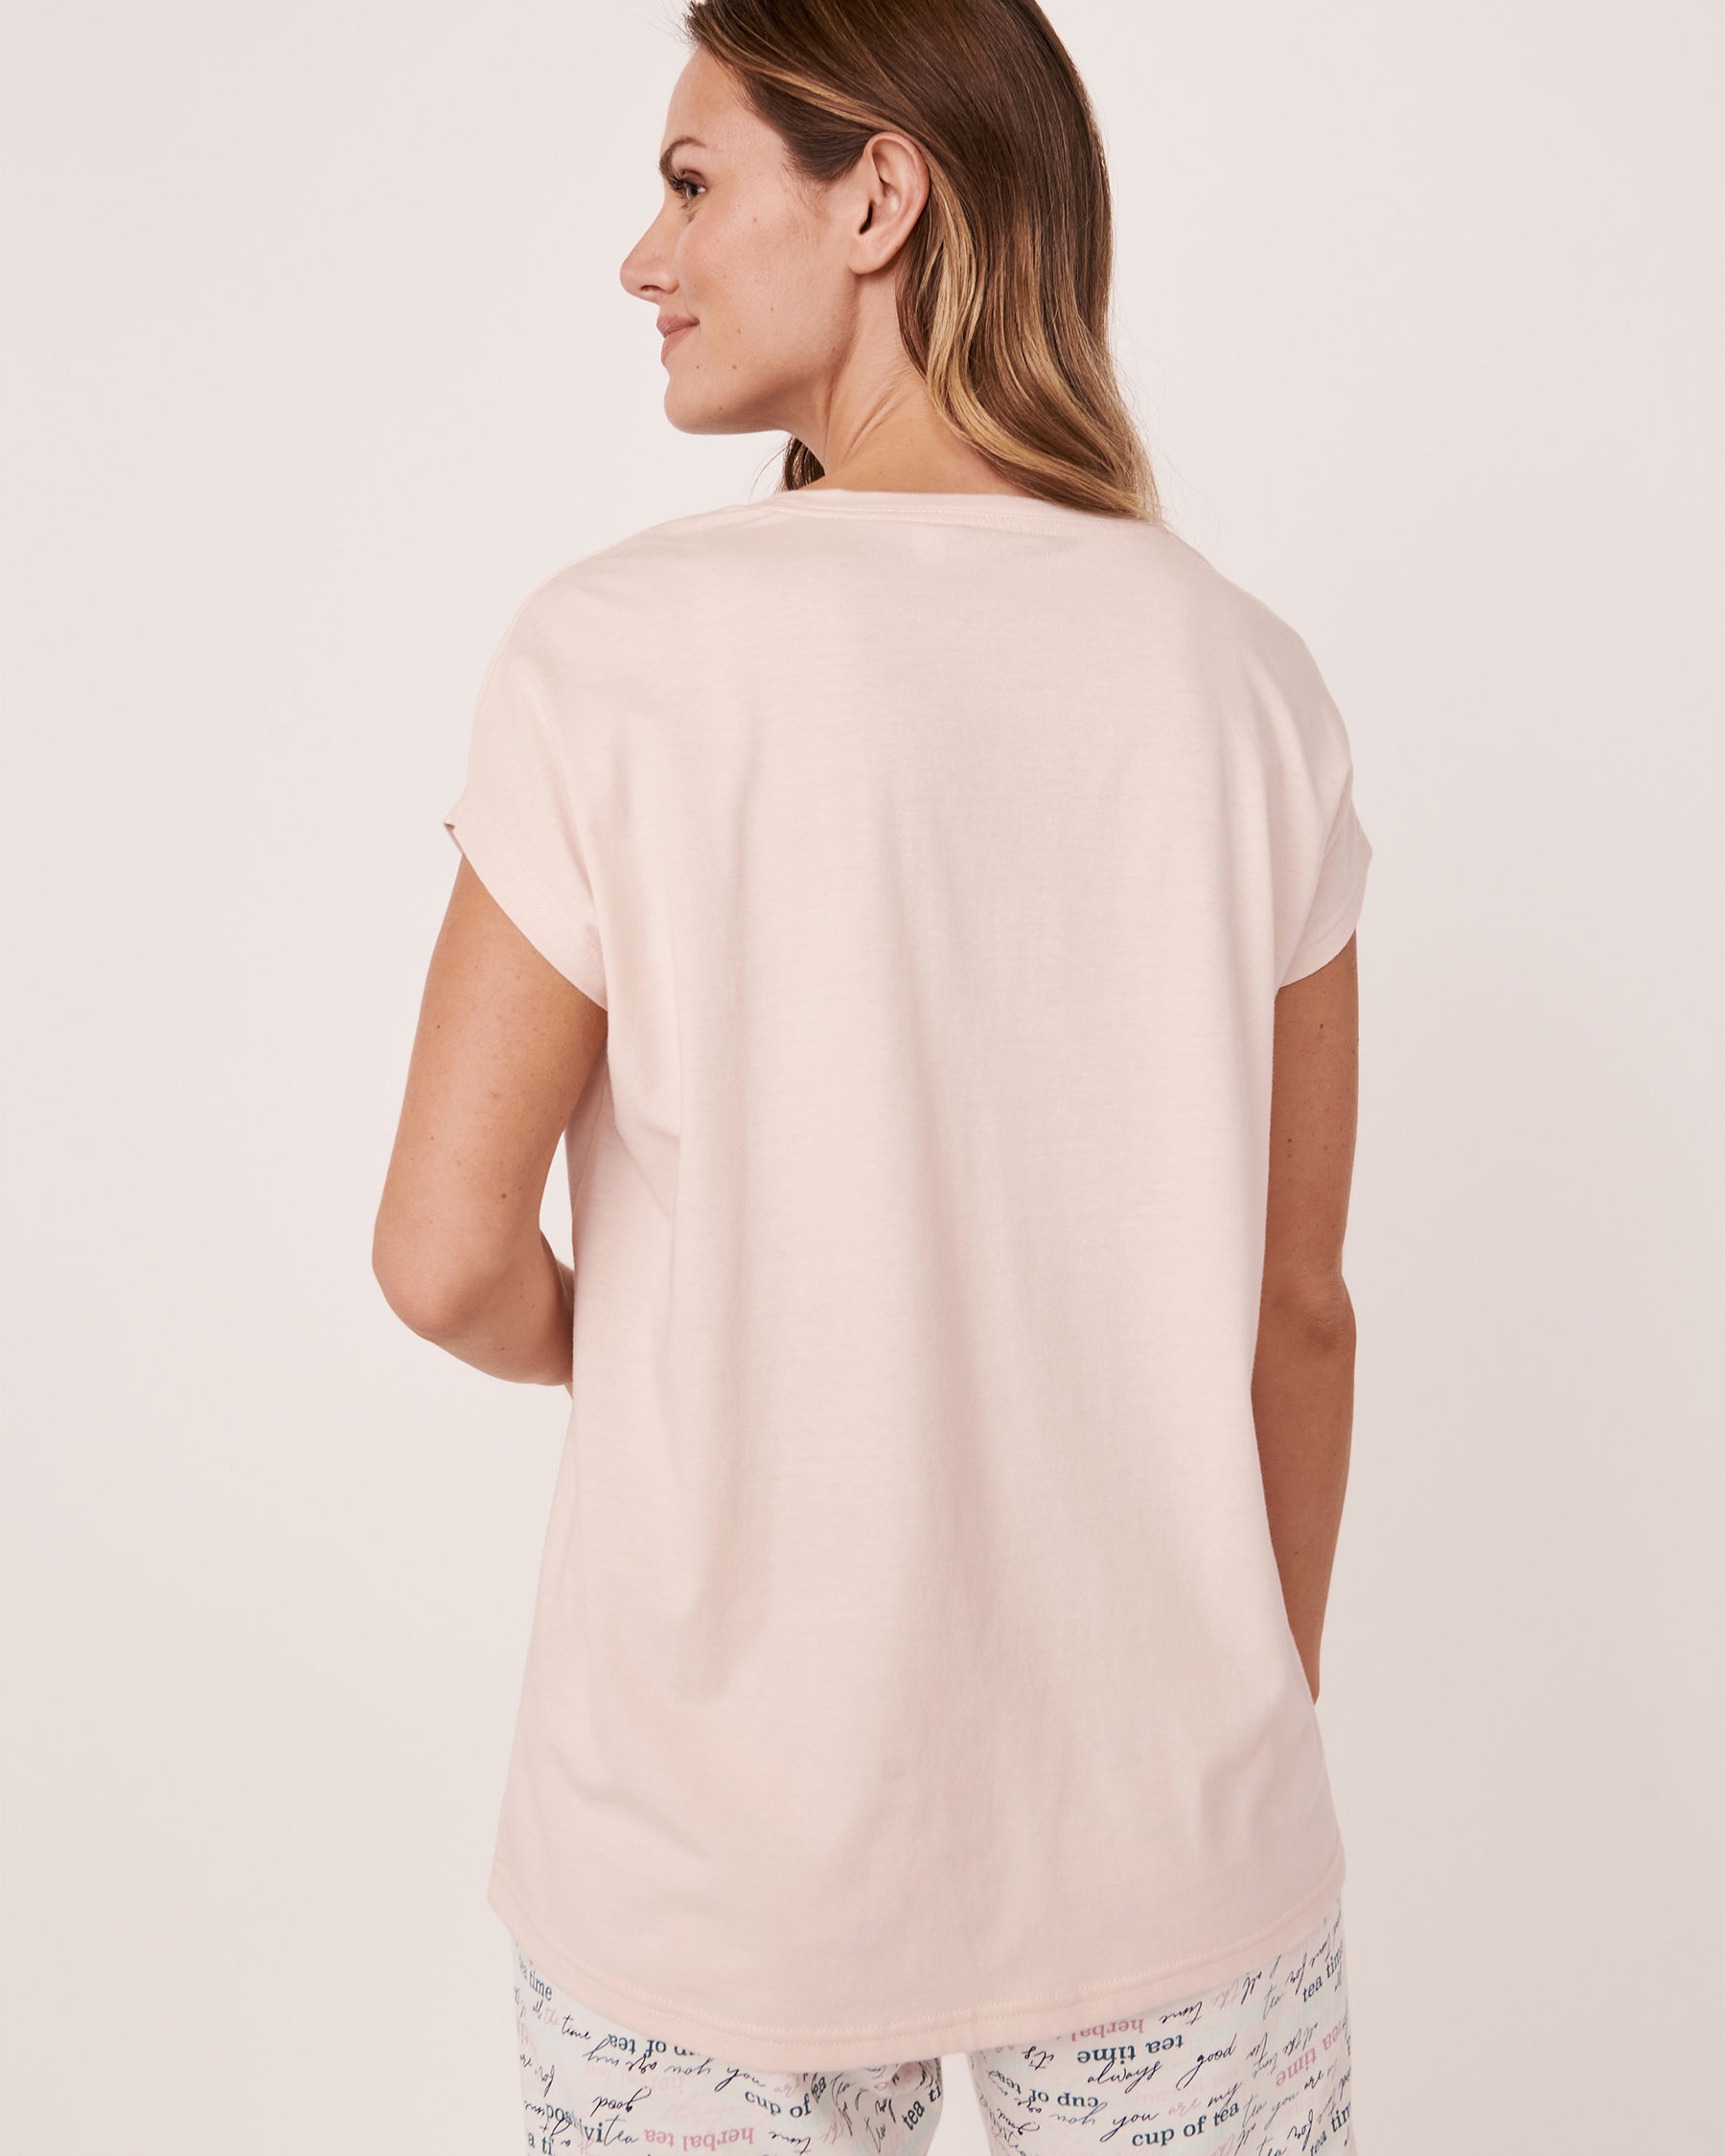 LA VIE EN ROSE Scoop Neck T-shirt Light pink 40100181 - View3